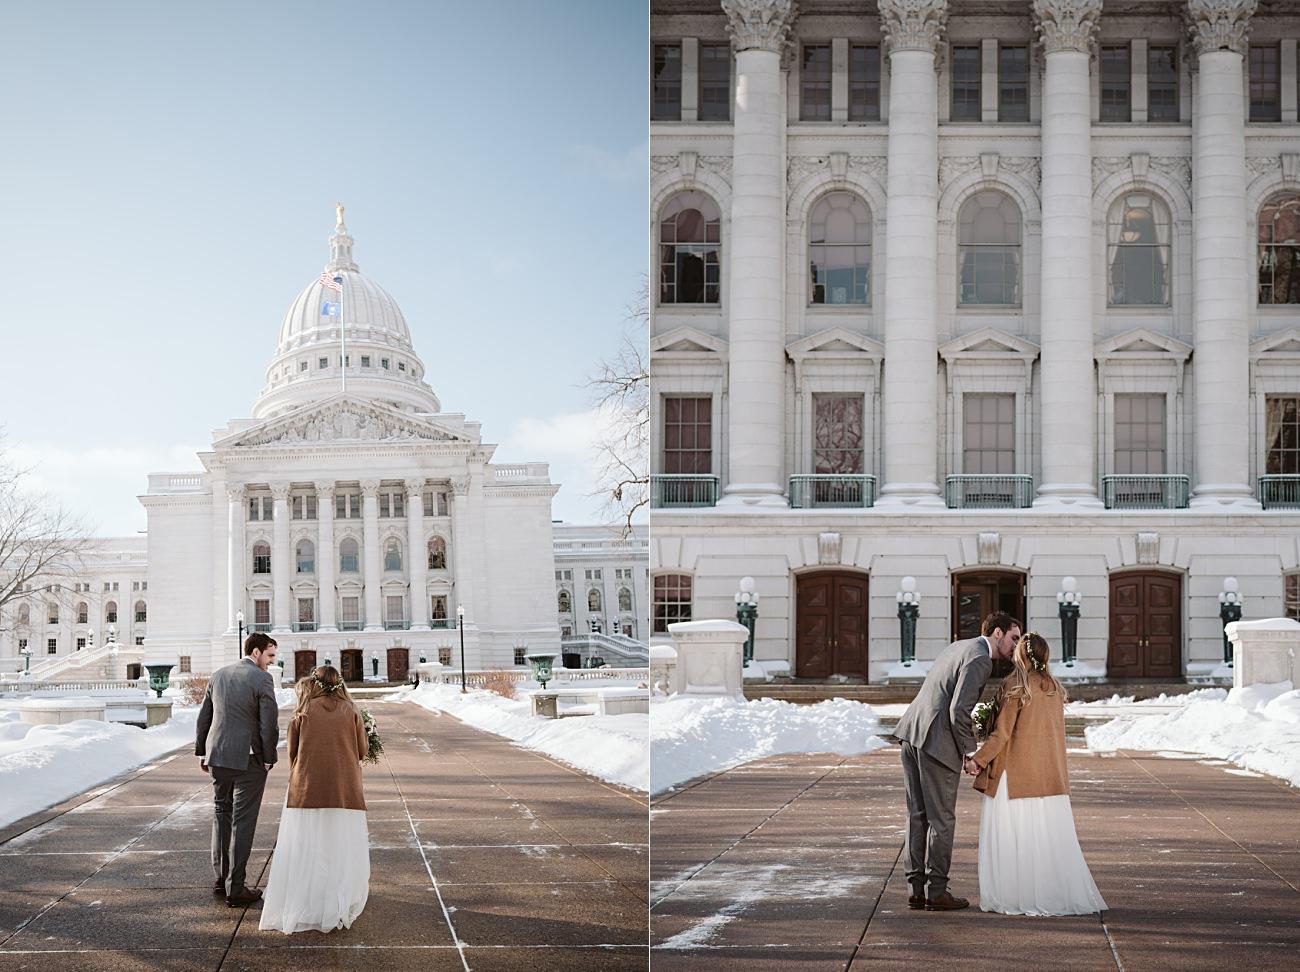 Madison Wisconsin Courthouse Elopement Wedding, Madison Wisconsin Wedding Photographer, Courthouse wedding, Wisconsin Elopement Photographer